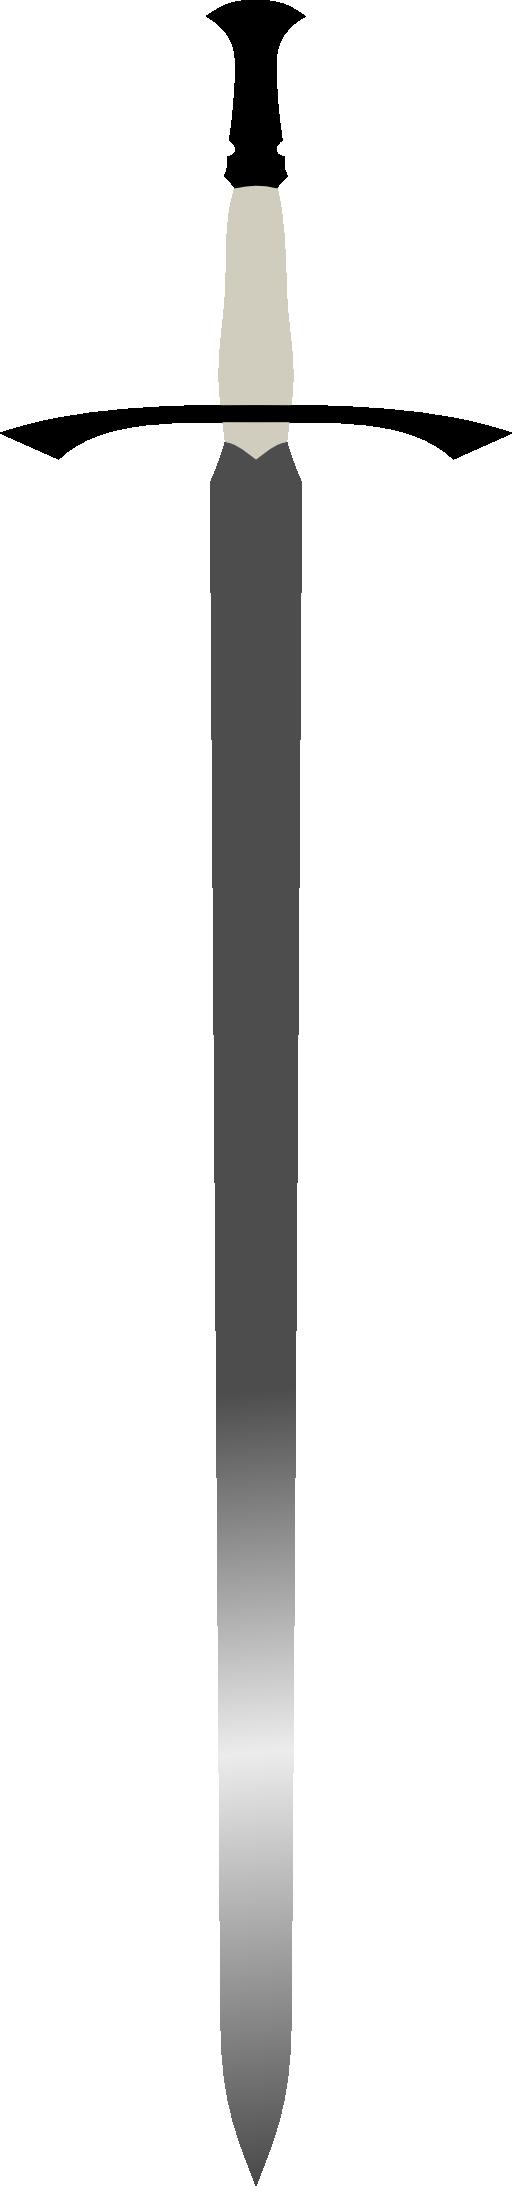 Sword clipart tiny 3